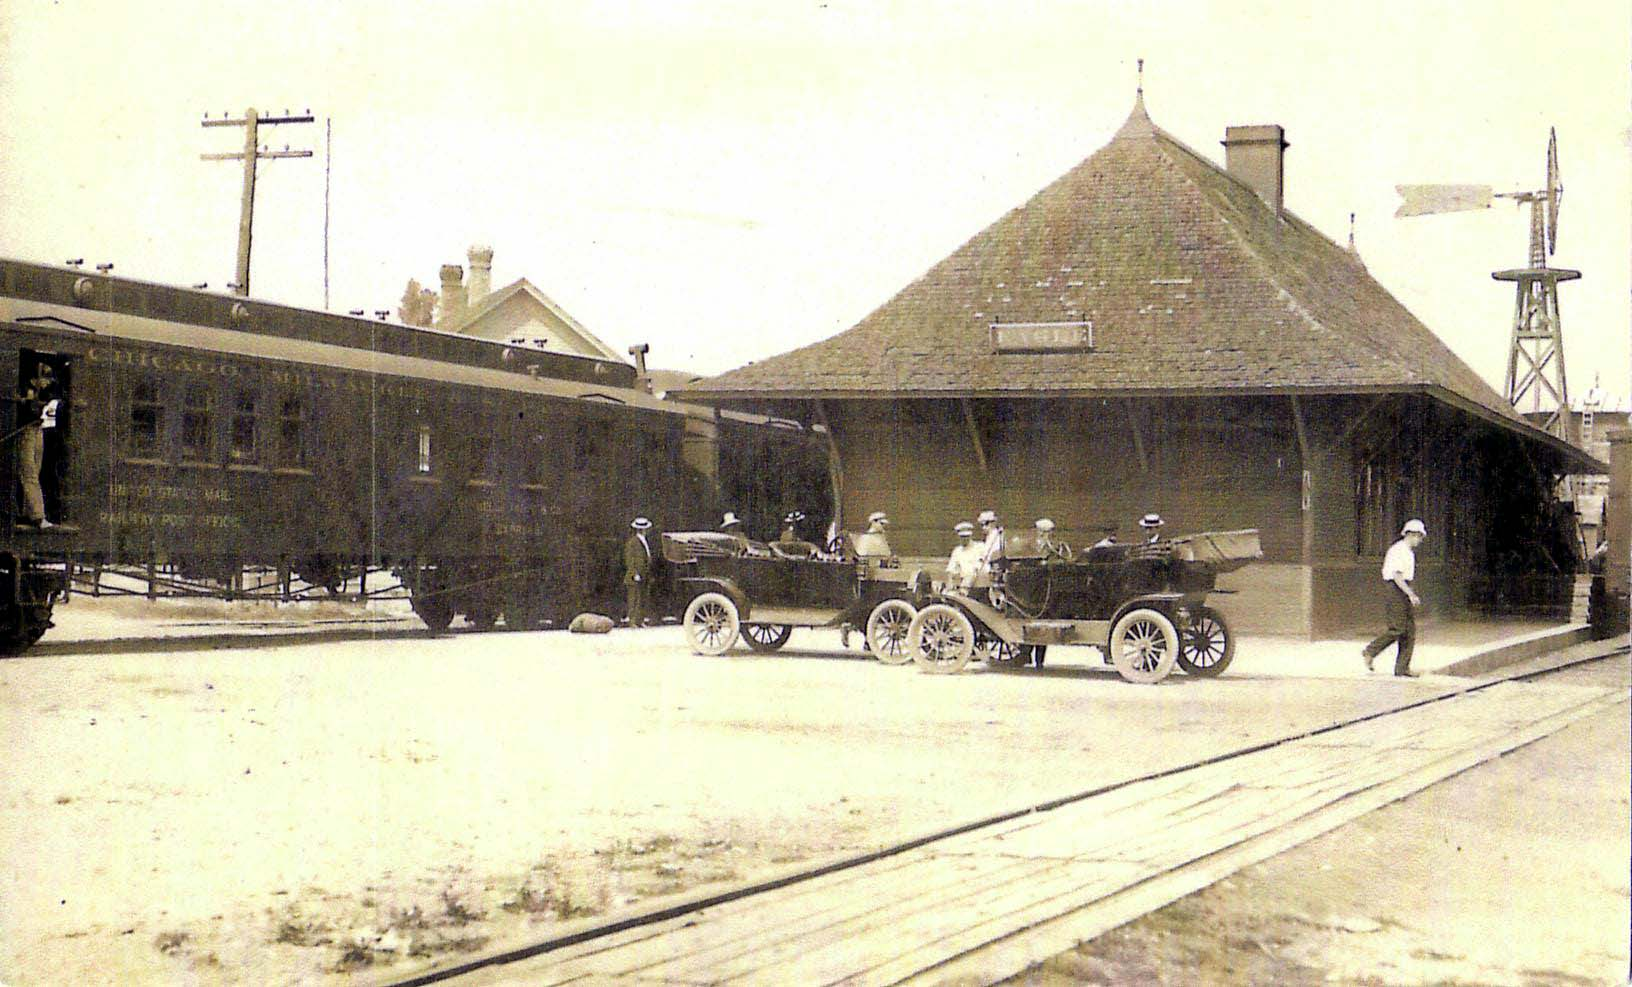 eagle-depot-w-train-1920s